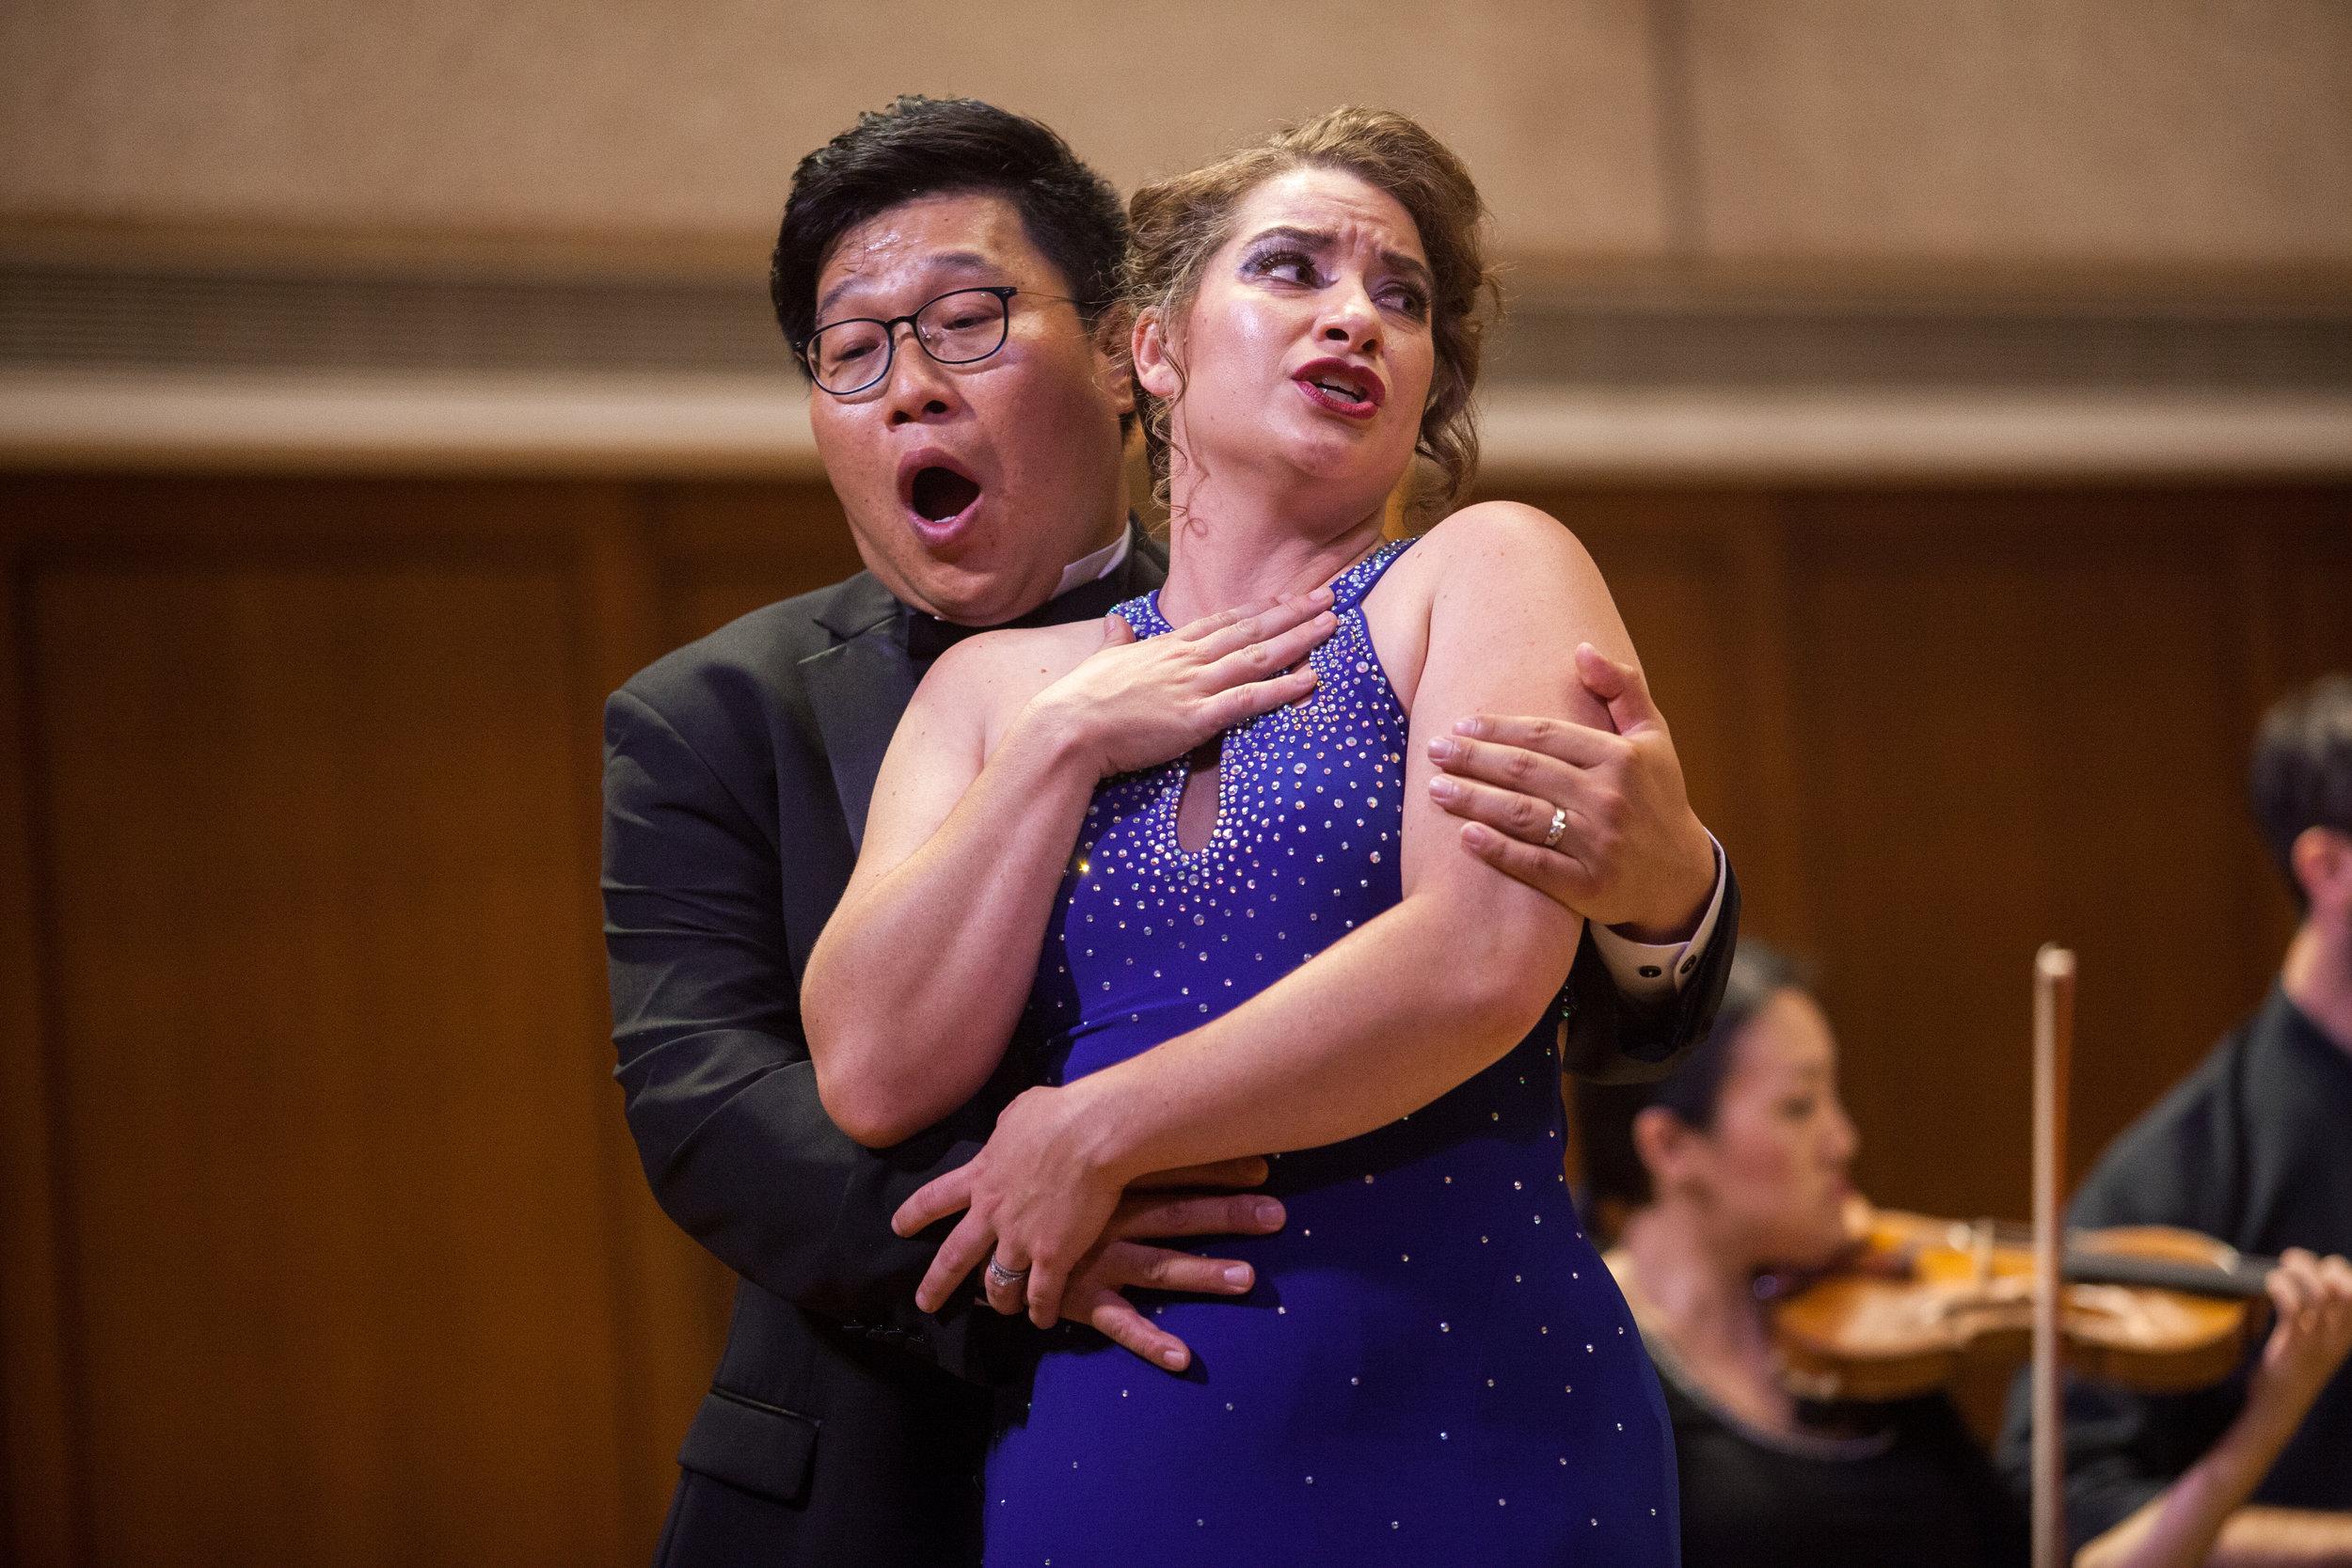 Soonchan Kwon, tenor, and Ellie Jarrett-Shattles, mezzo-soprano, singing with the Round Rock Symphony.